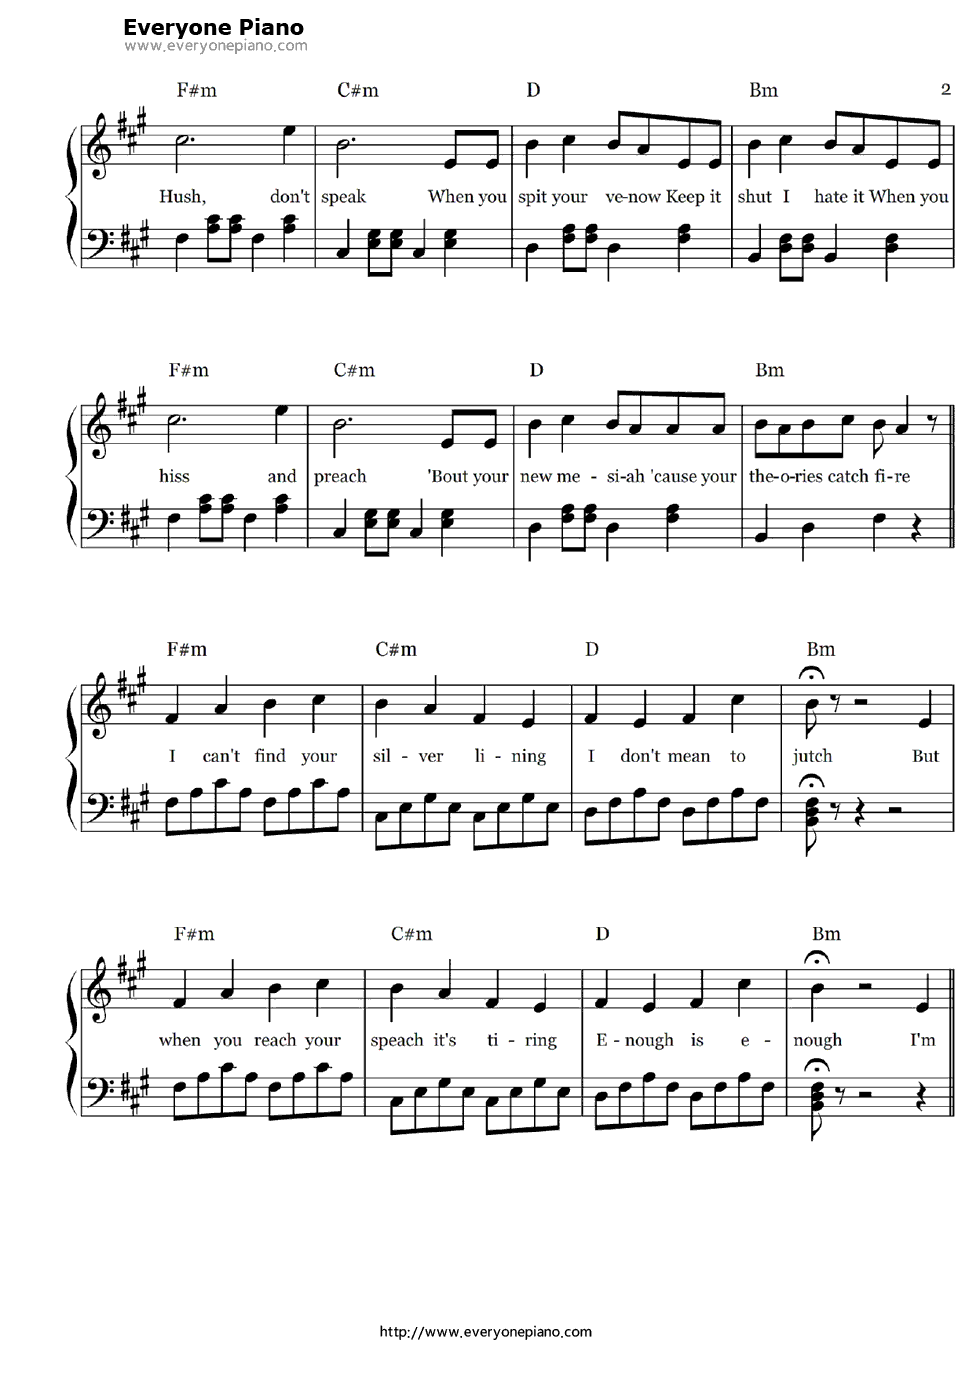 sam smith palace sheet music pdf